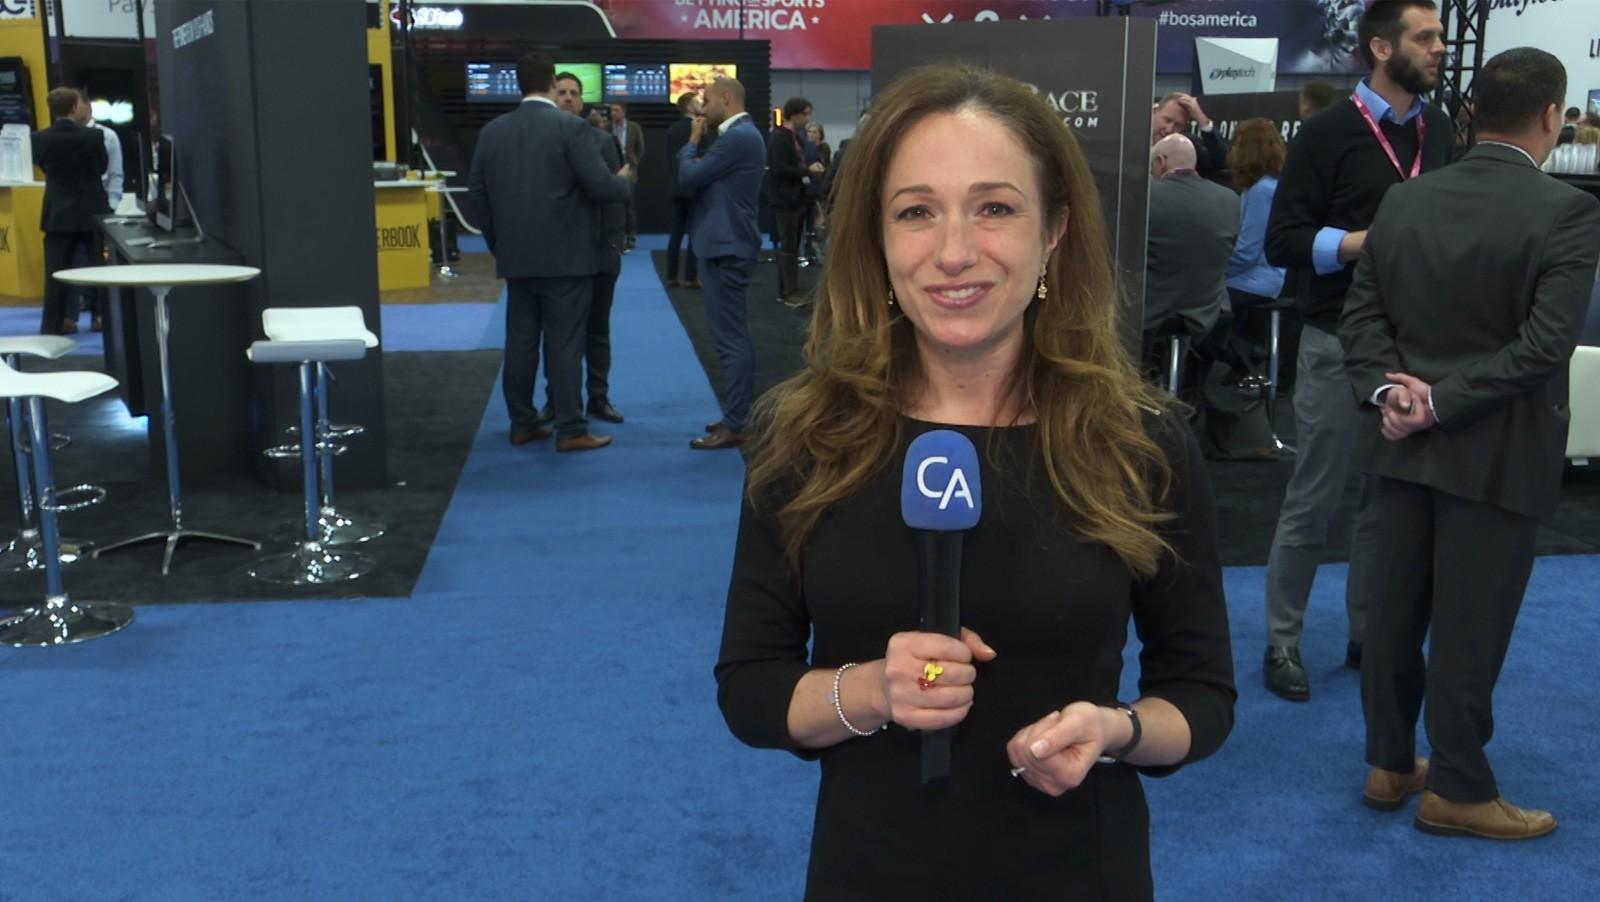 Betting on Sports America 2019 Day 1 recap